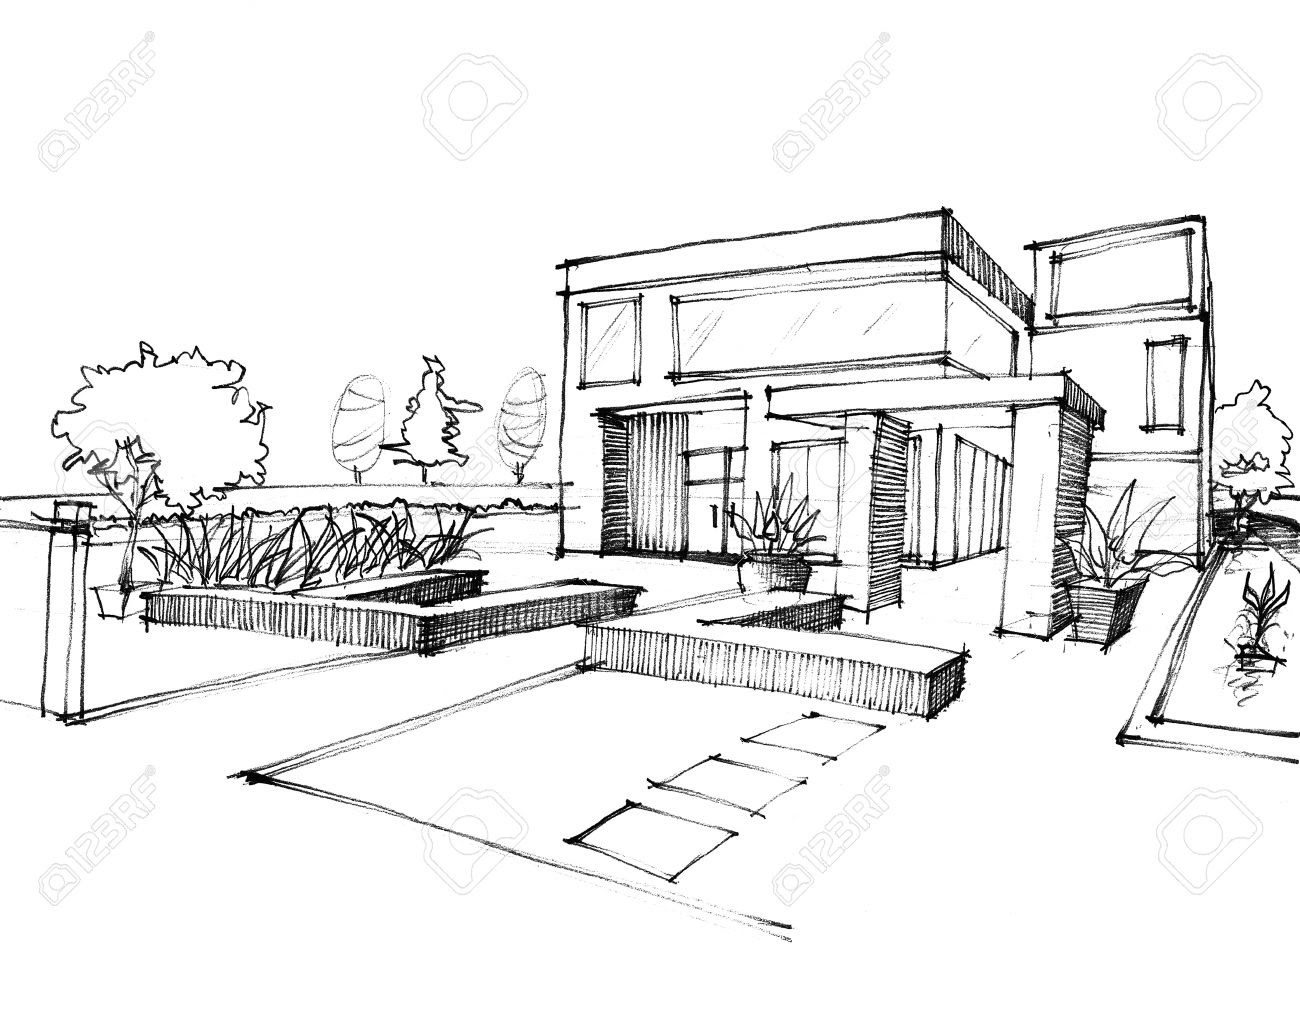 House Design Sketch